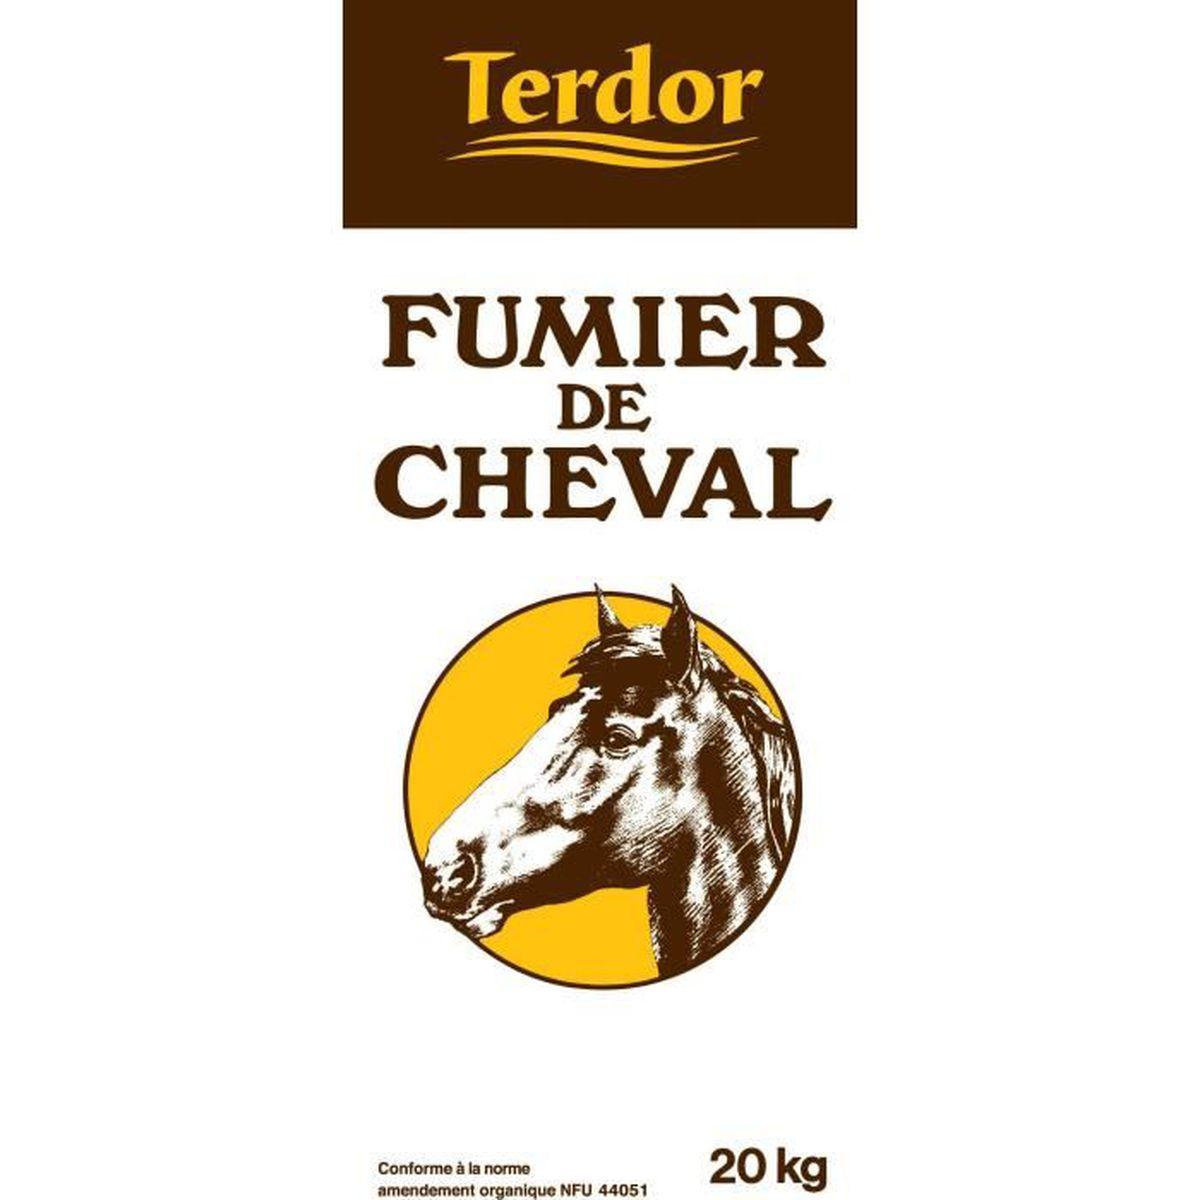 fumier de cheval achat vente terreau sable fumier de cheval cdiscount. Black Bedroom Furniture Sets. Home Design Ideas